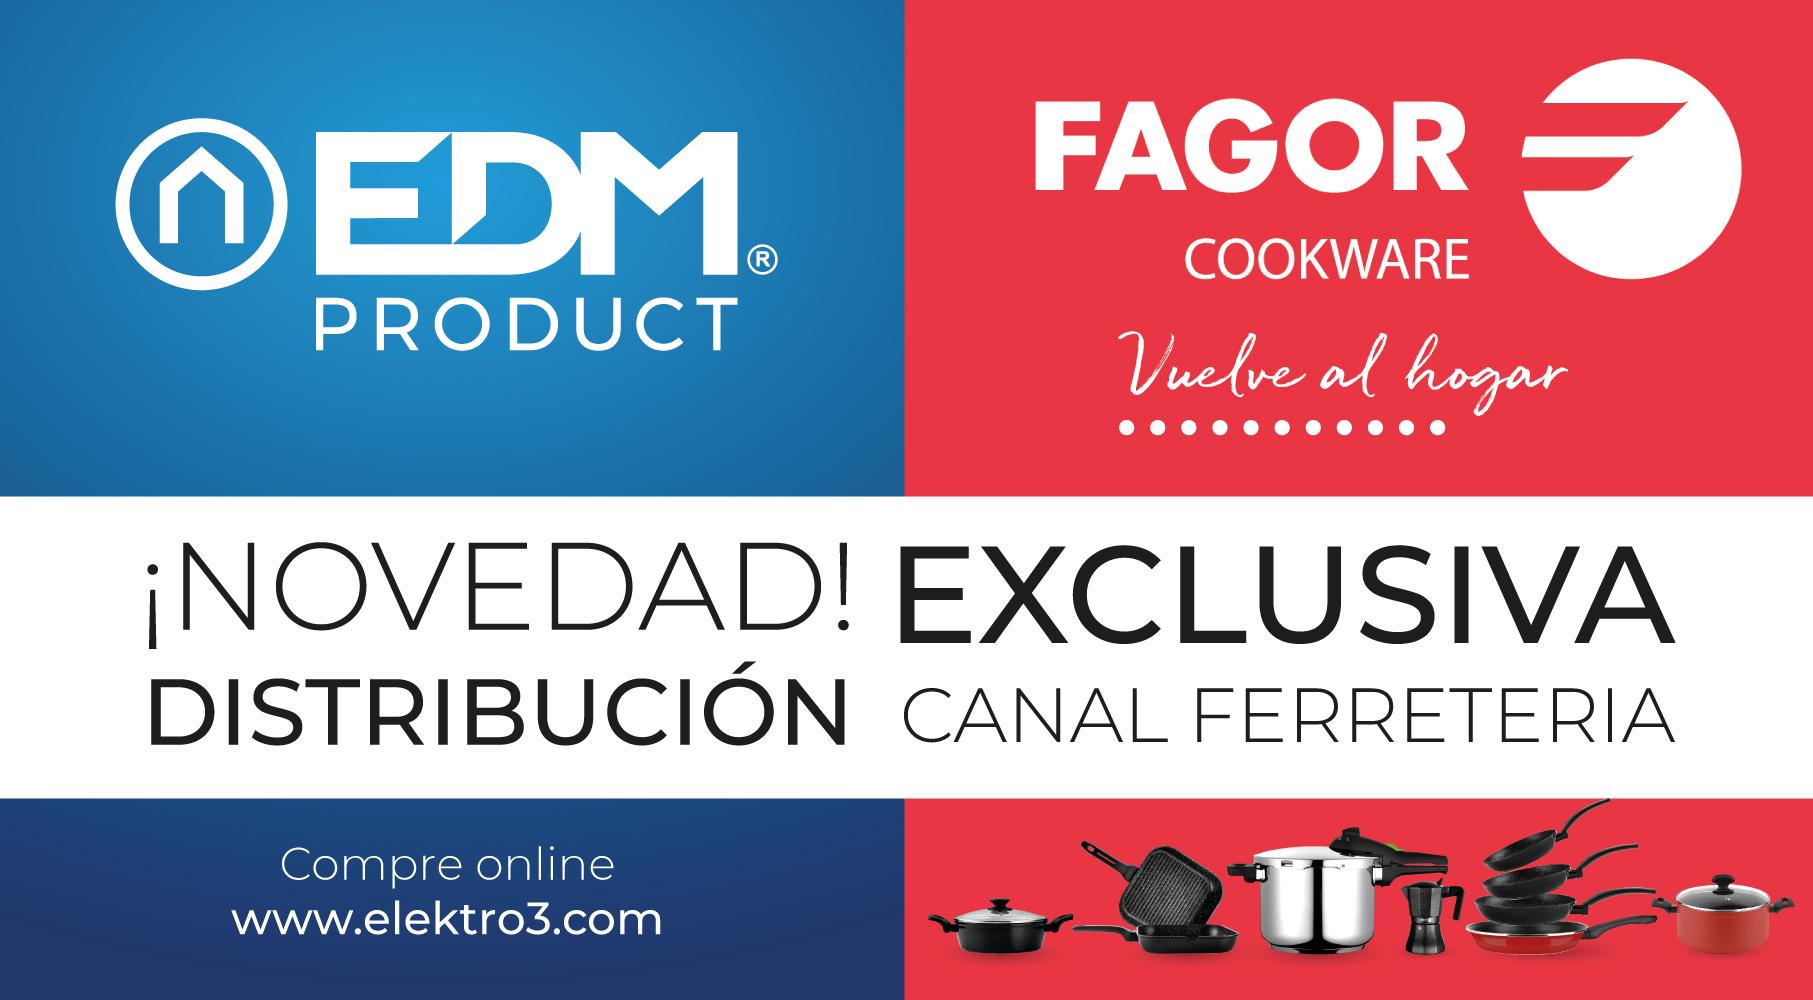 New commercial agreement Fagor - Elektro3-EDM